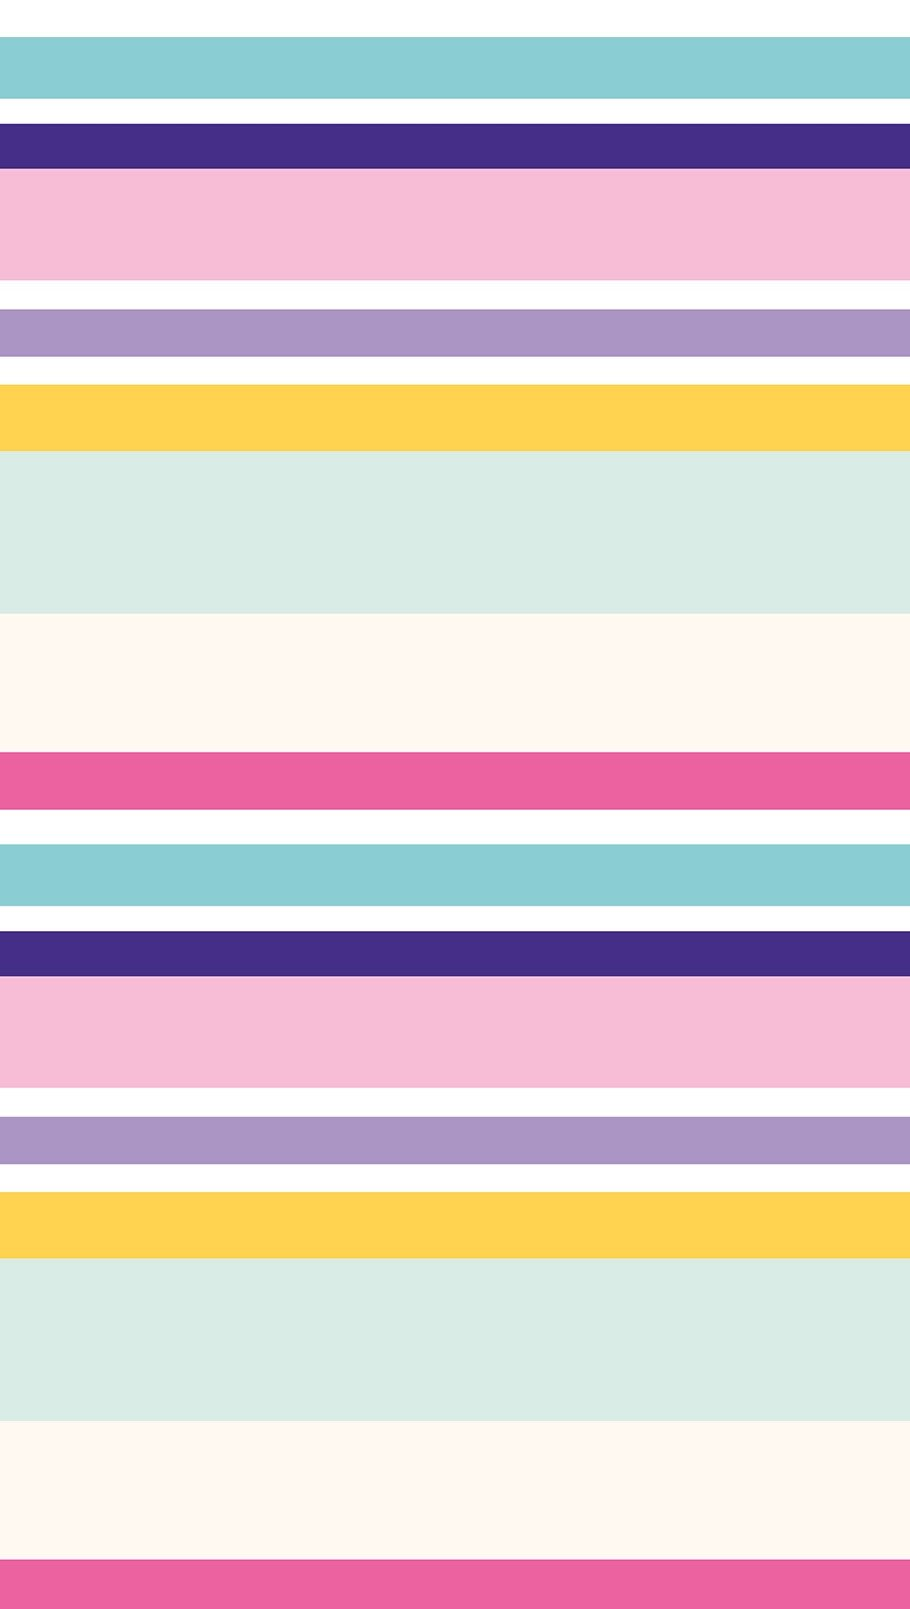 Wallpaper Kiut Pastel colored lines Vertical